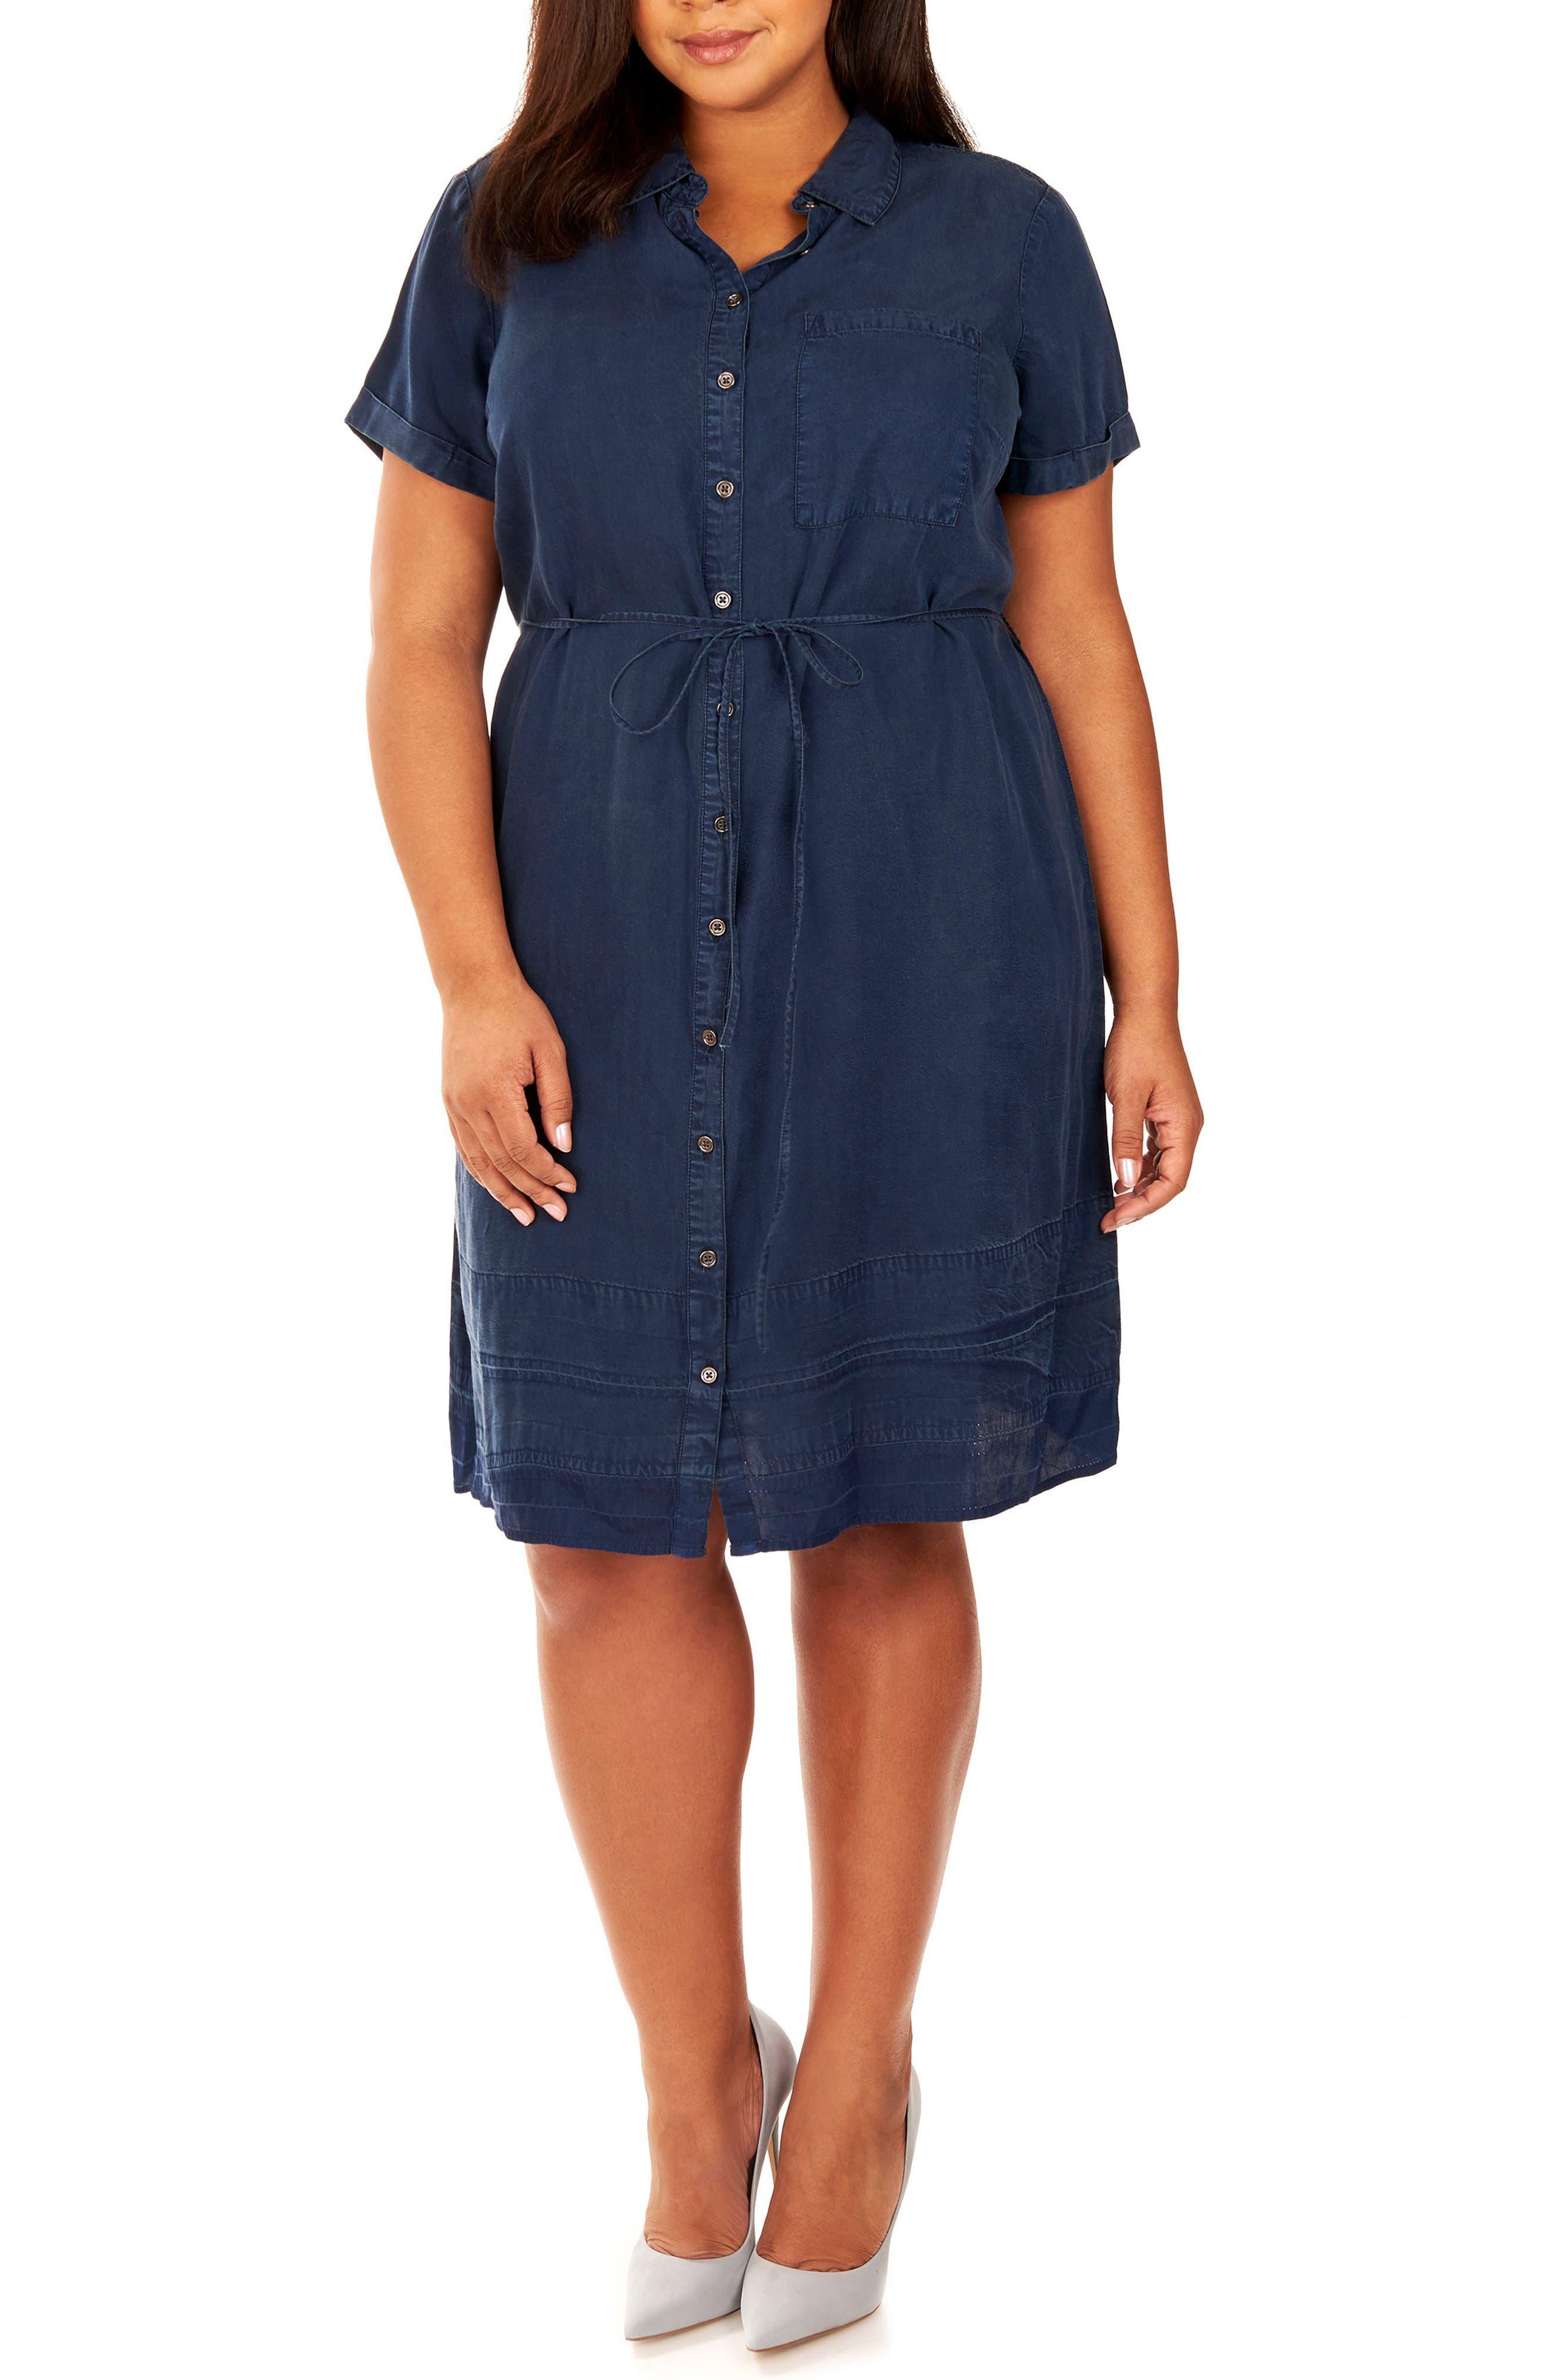 REBEL WILSON X ANGELS Chambray Button-Up Shirtdress (Plus Size)